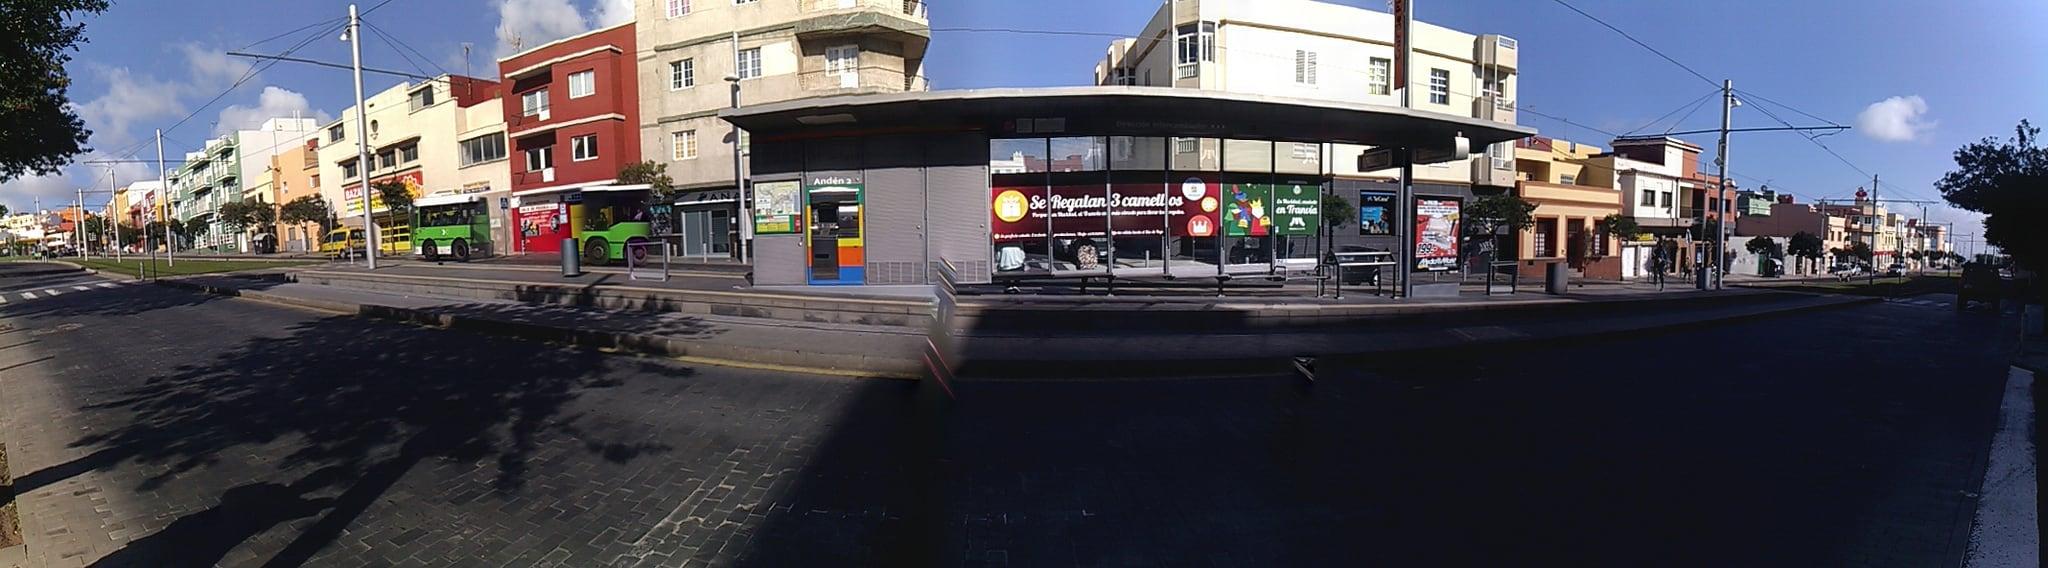 Cruz de Piedra görüntü.